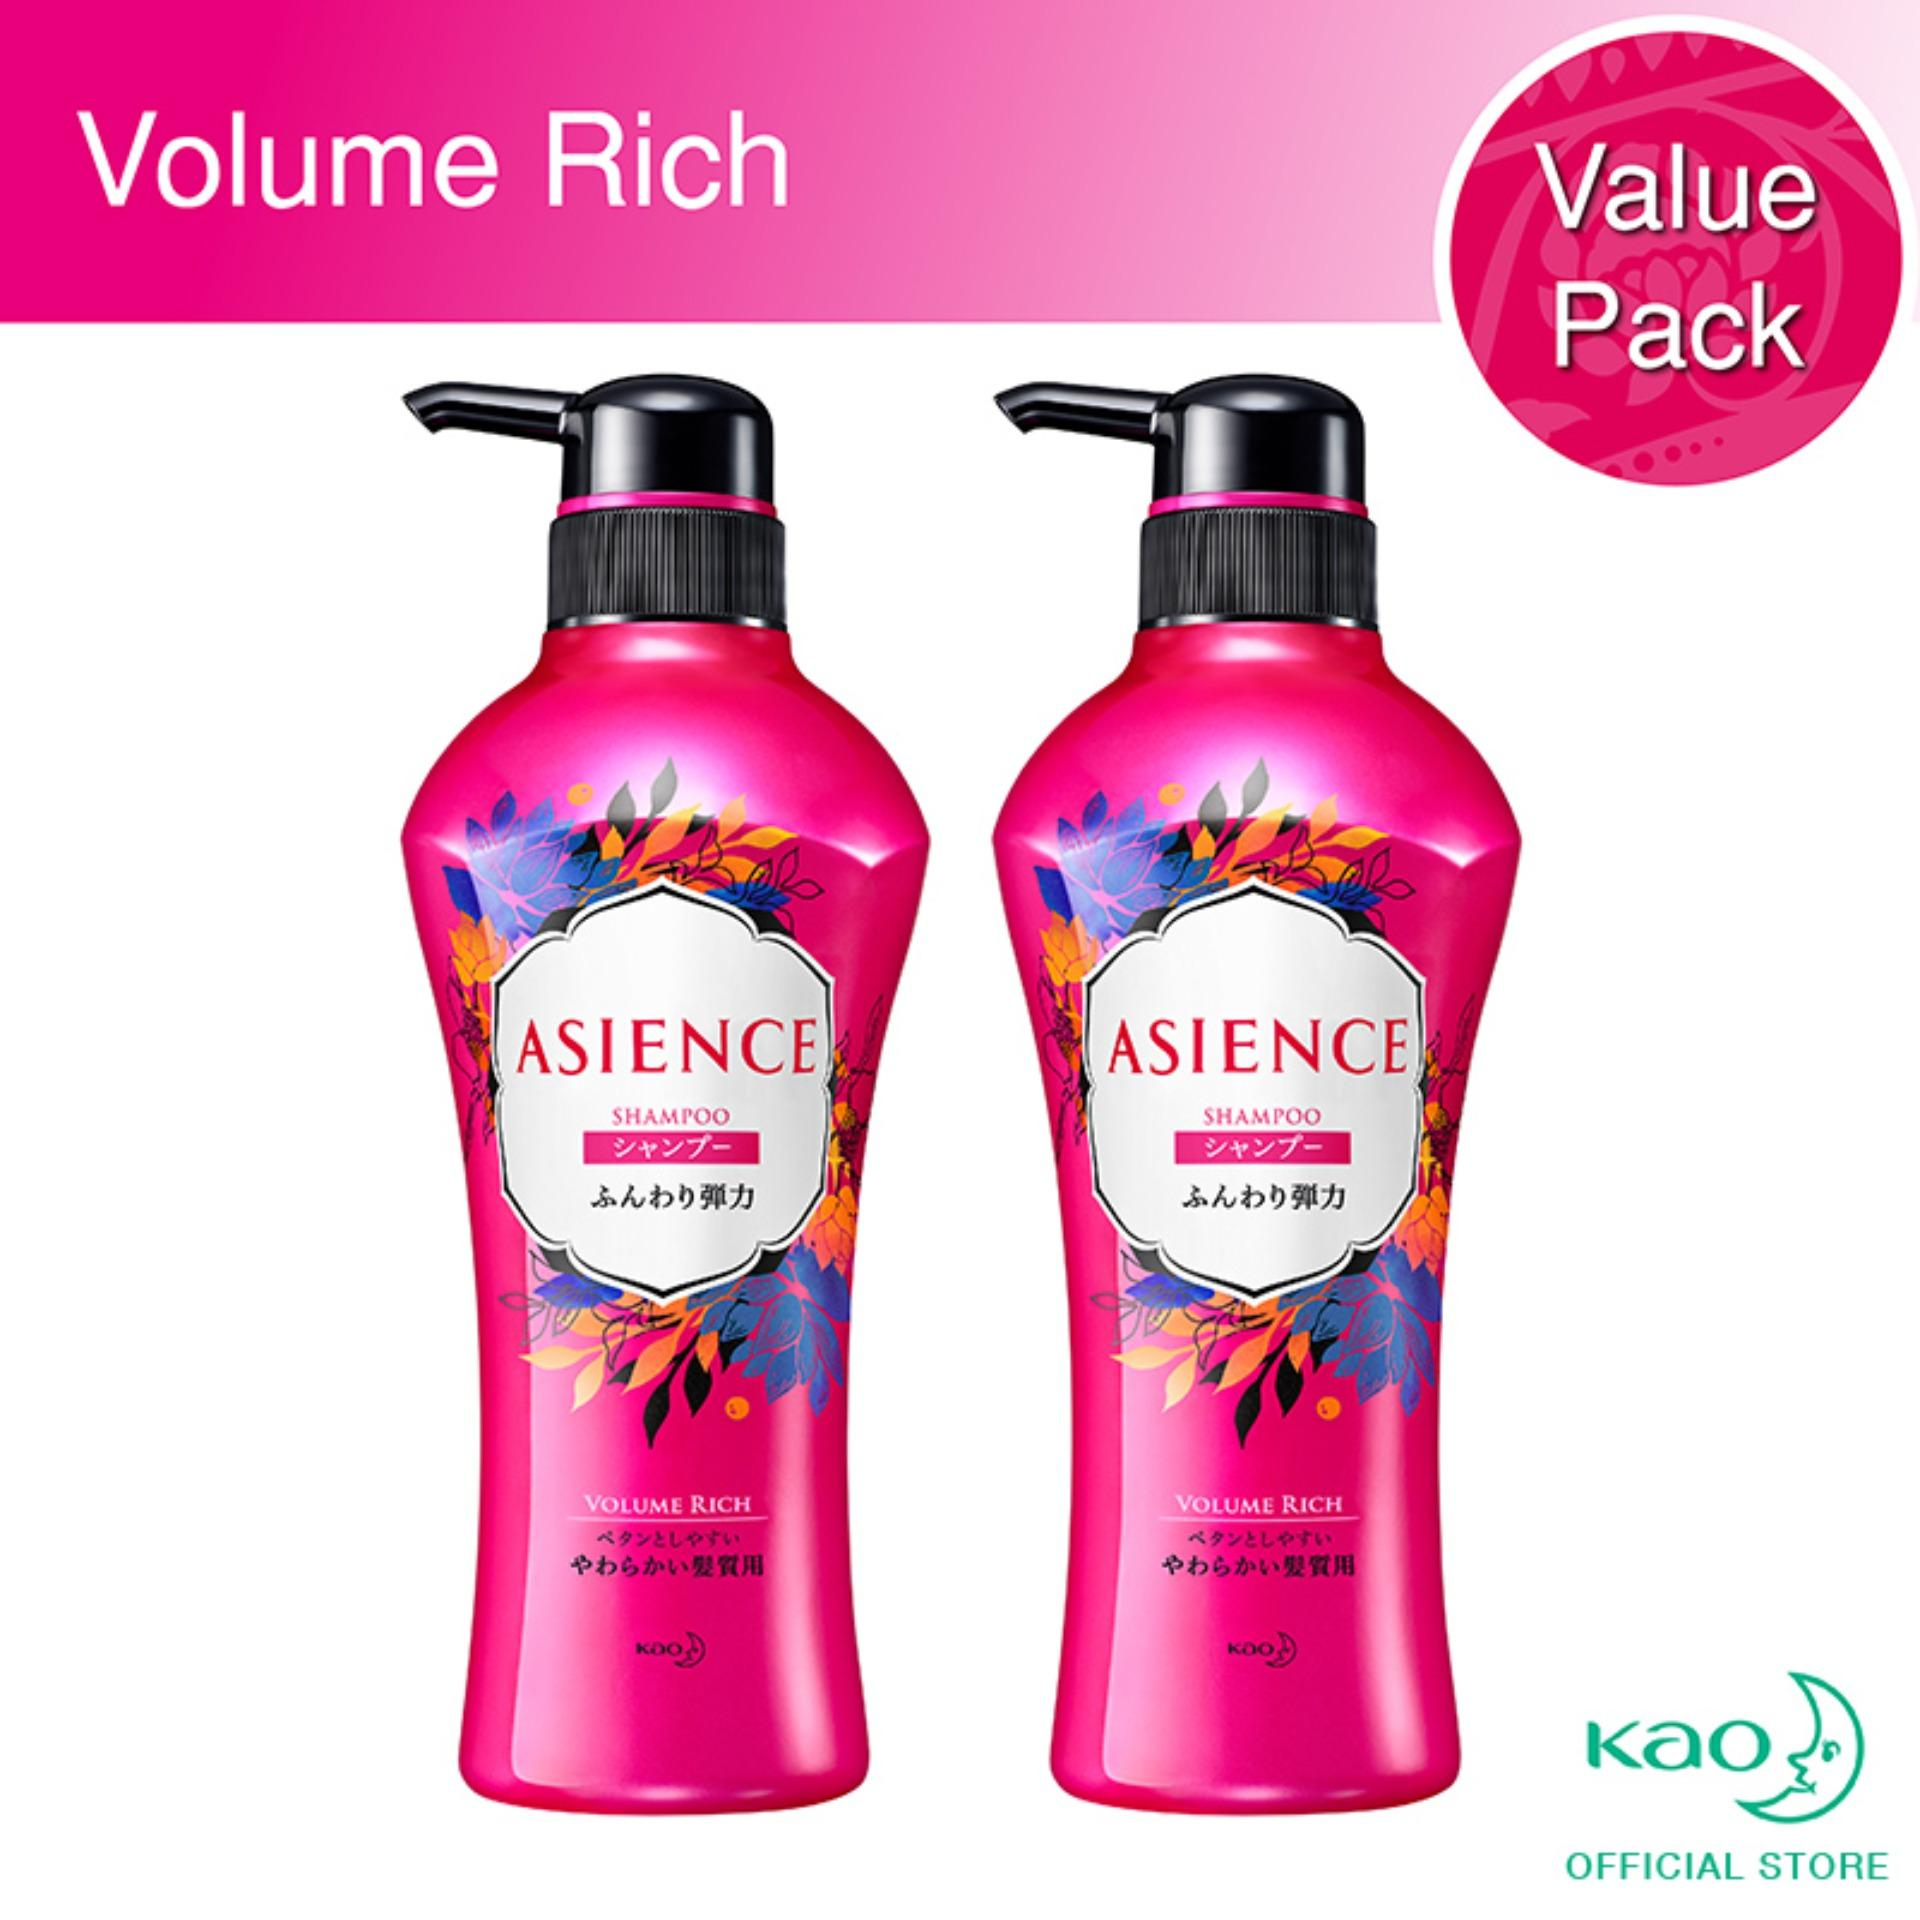 Buy Asience Volume Rich Shampoo 2X 450Ml Asience